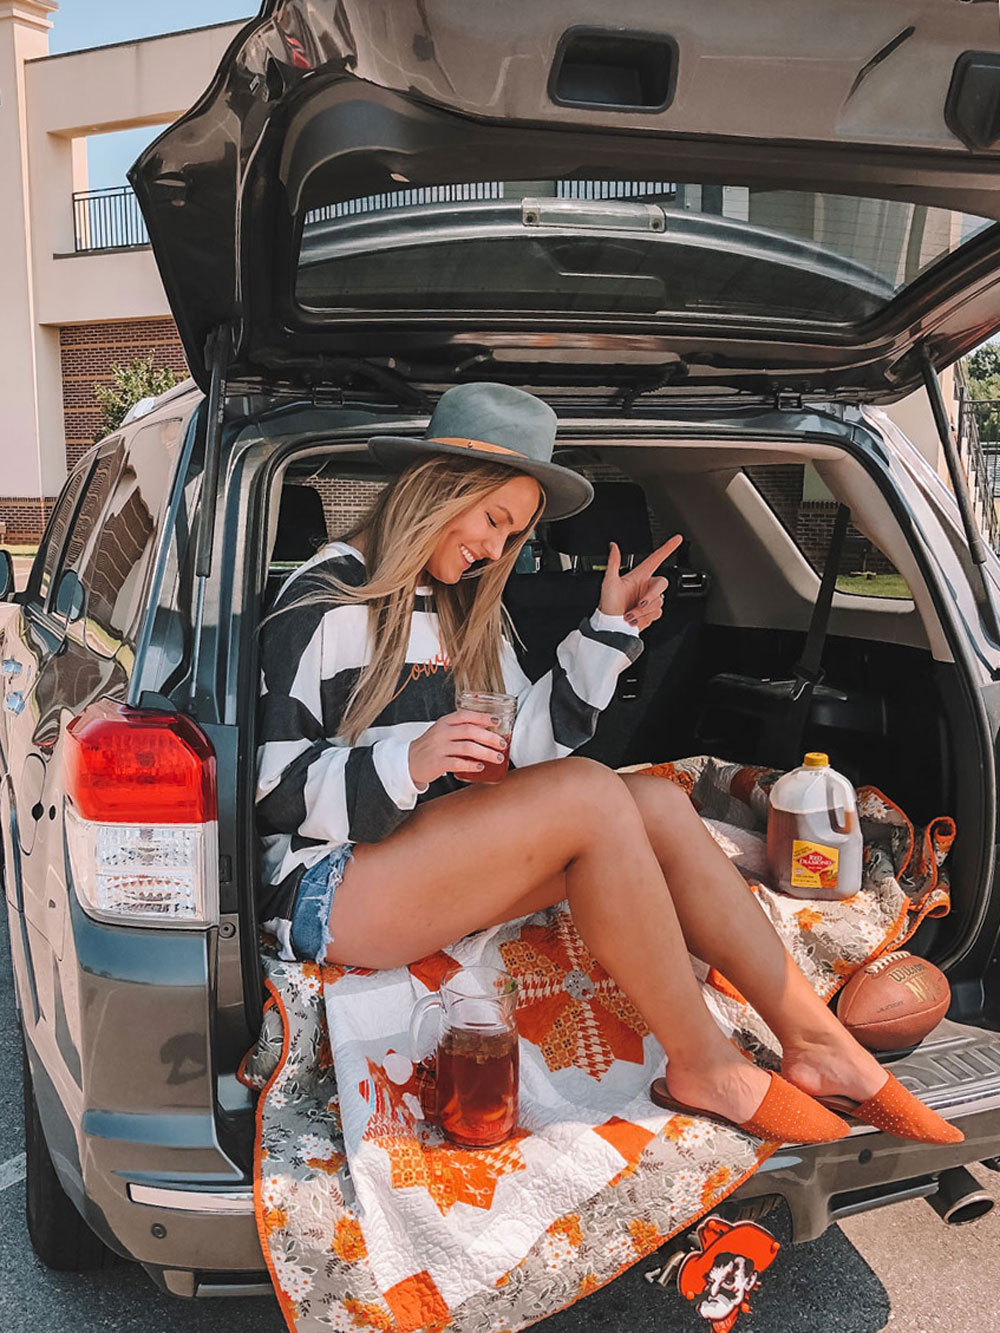 Go Pokes! Oklahoma blogger Amanda's OK shares her tailgate beverage of choice for Oklahoma State football games